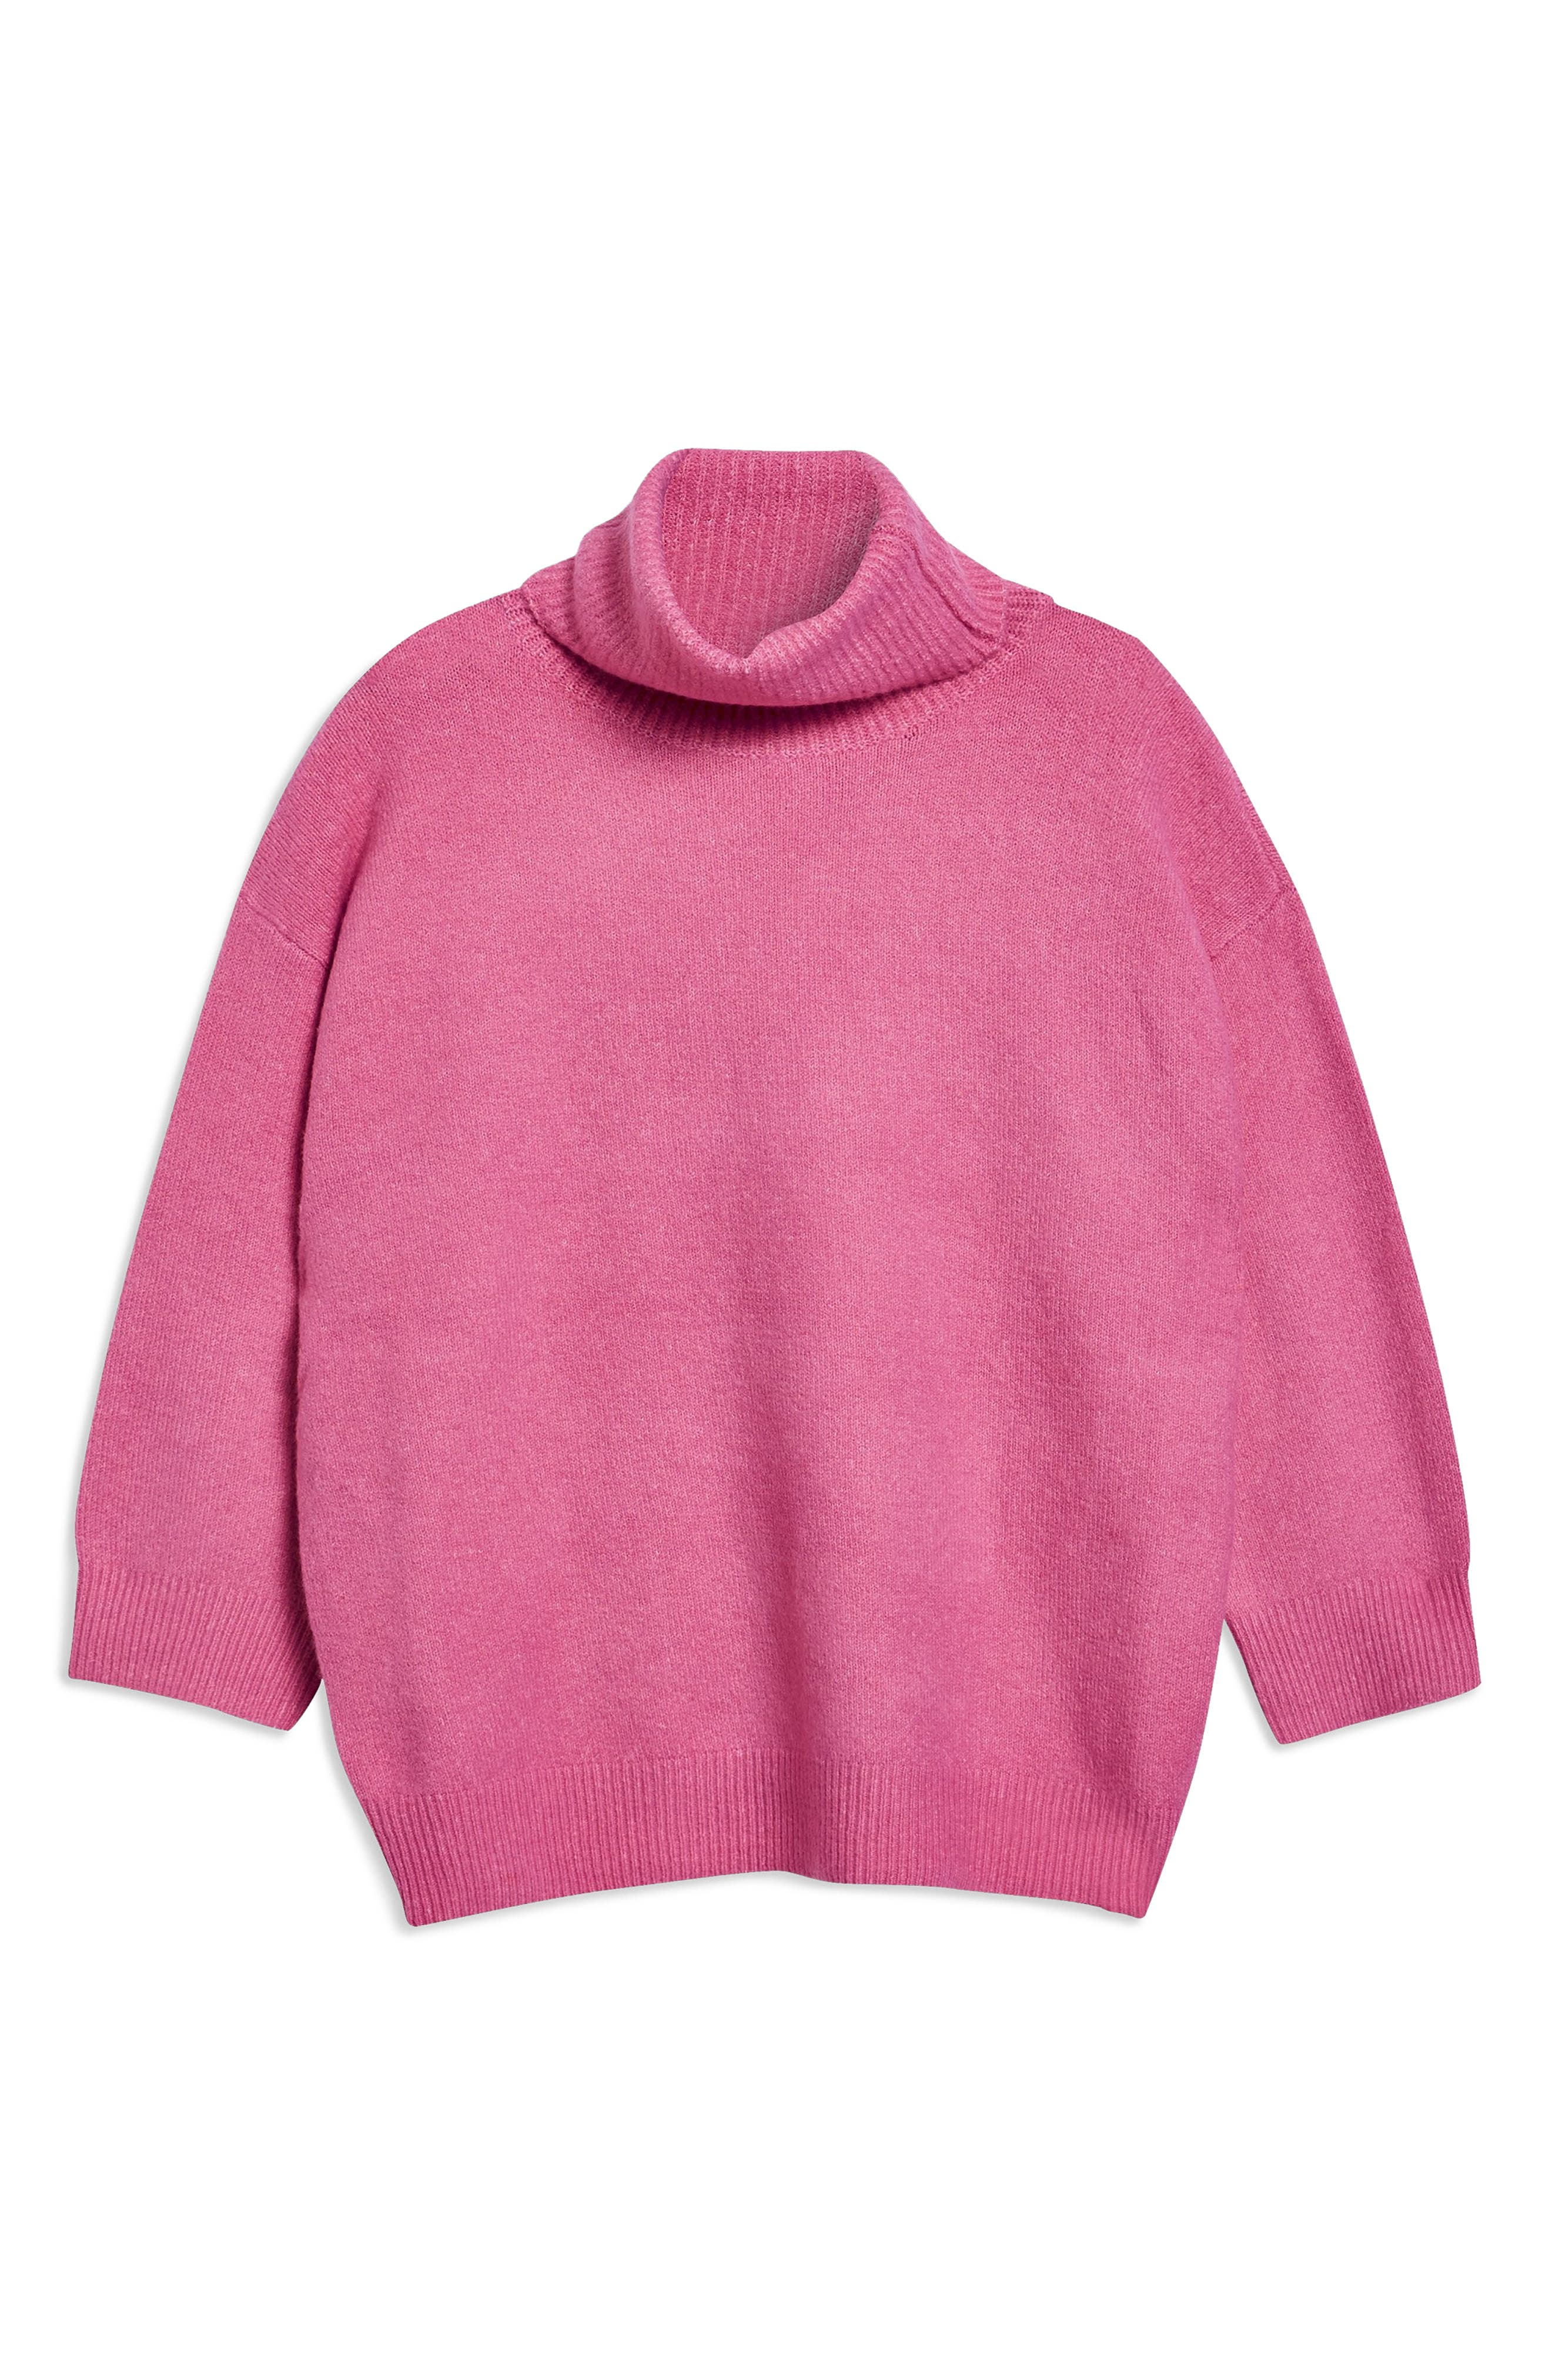 Oversize Turtleneck Sweater,                             Alternate thumbnail 3, color,                             BRIGHT PINK